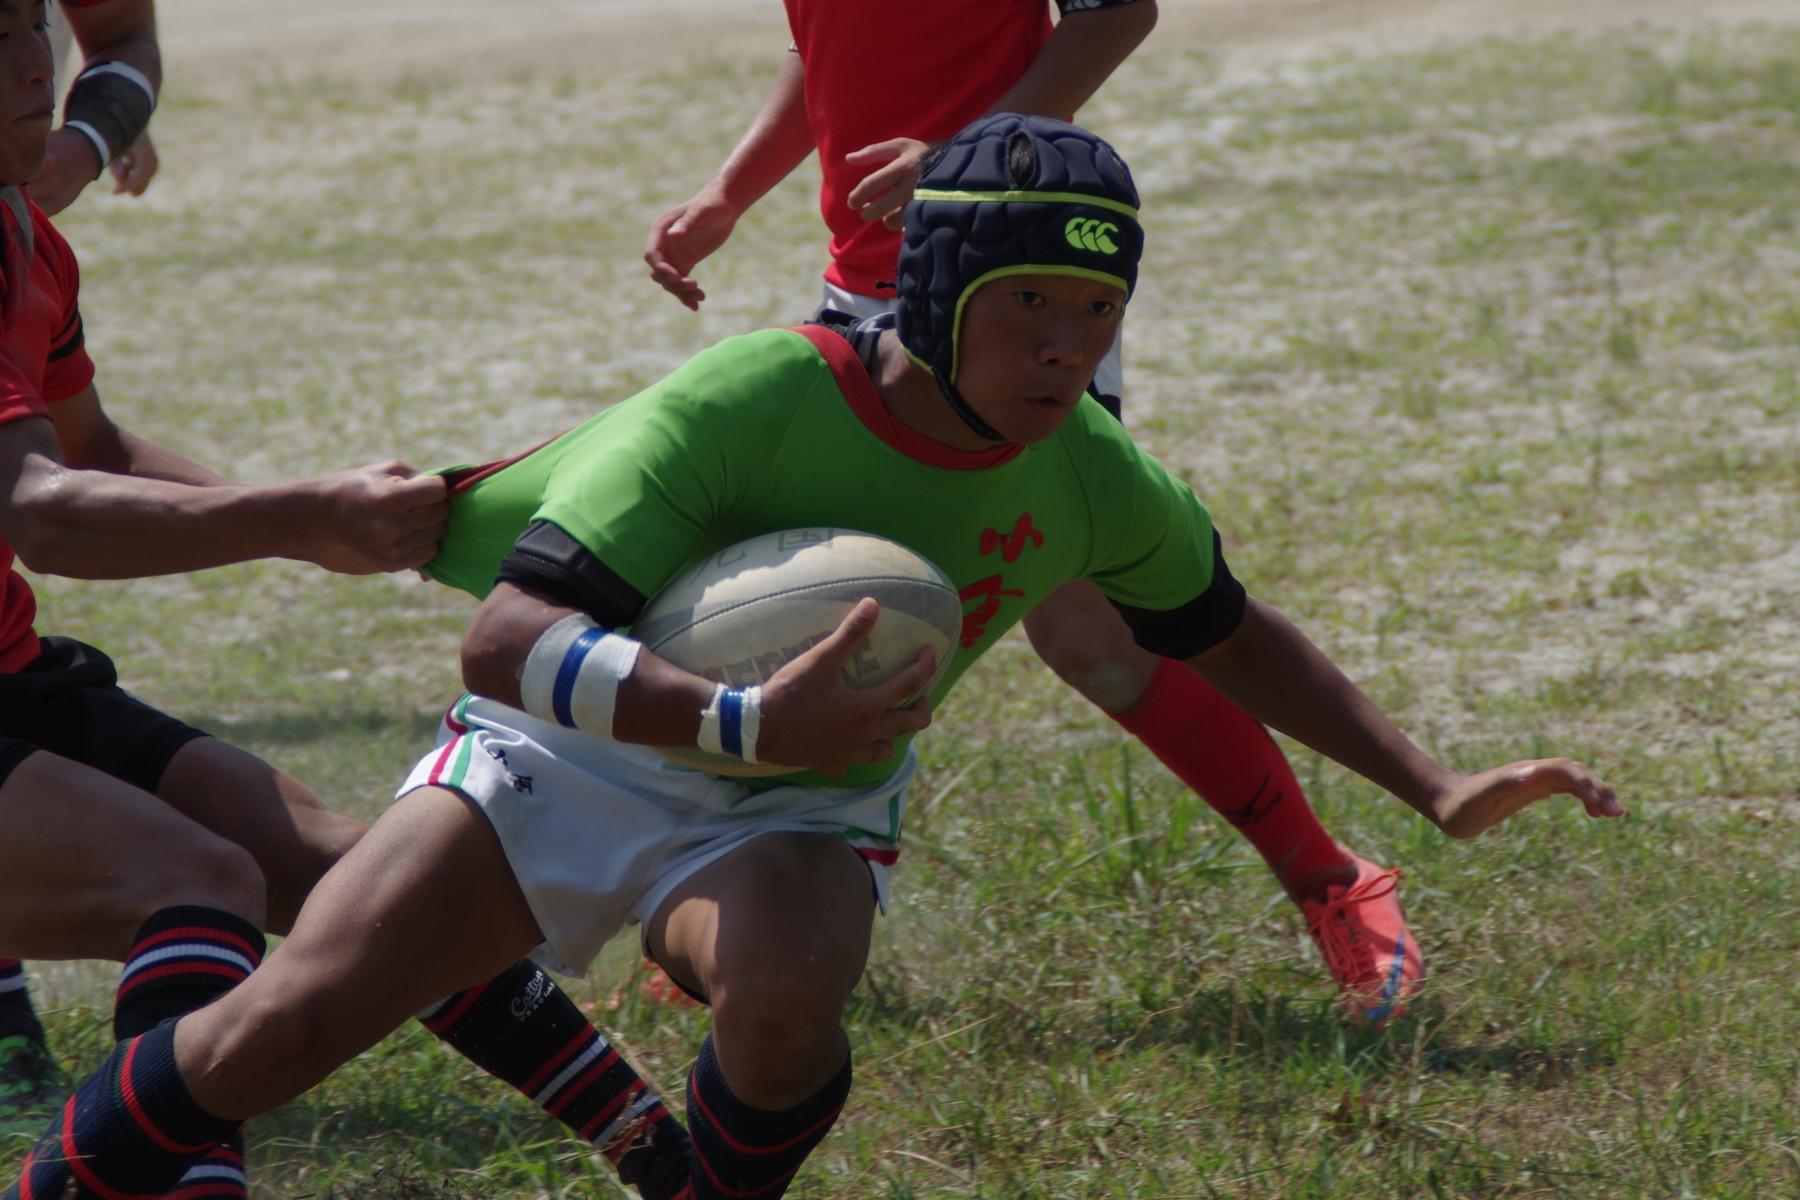 http://kokura-rugby.sakura.ne.jp/180806_104240_0109.jpg